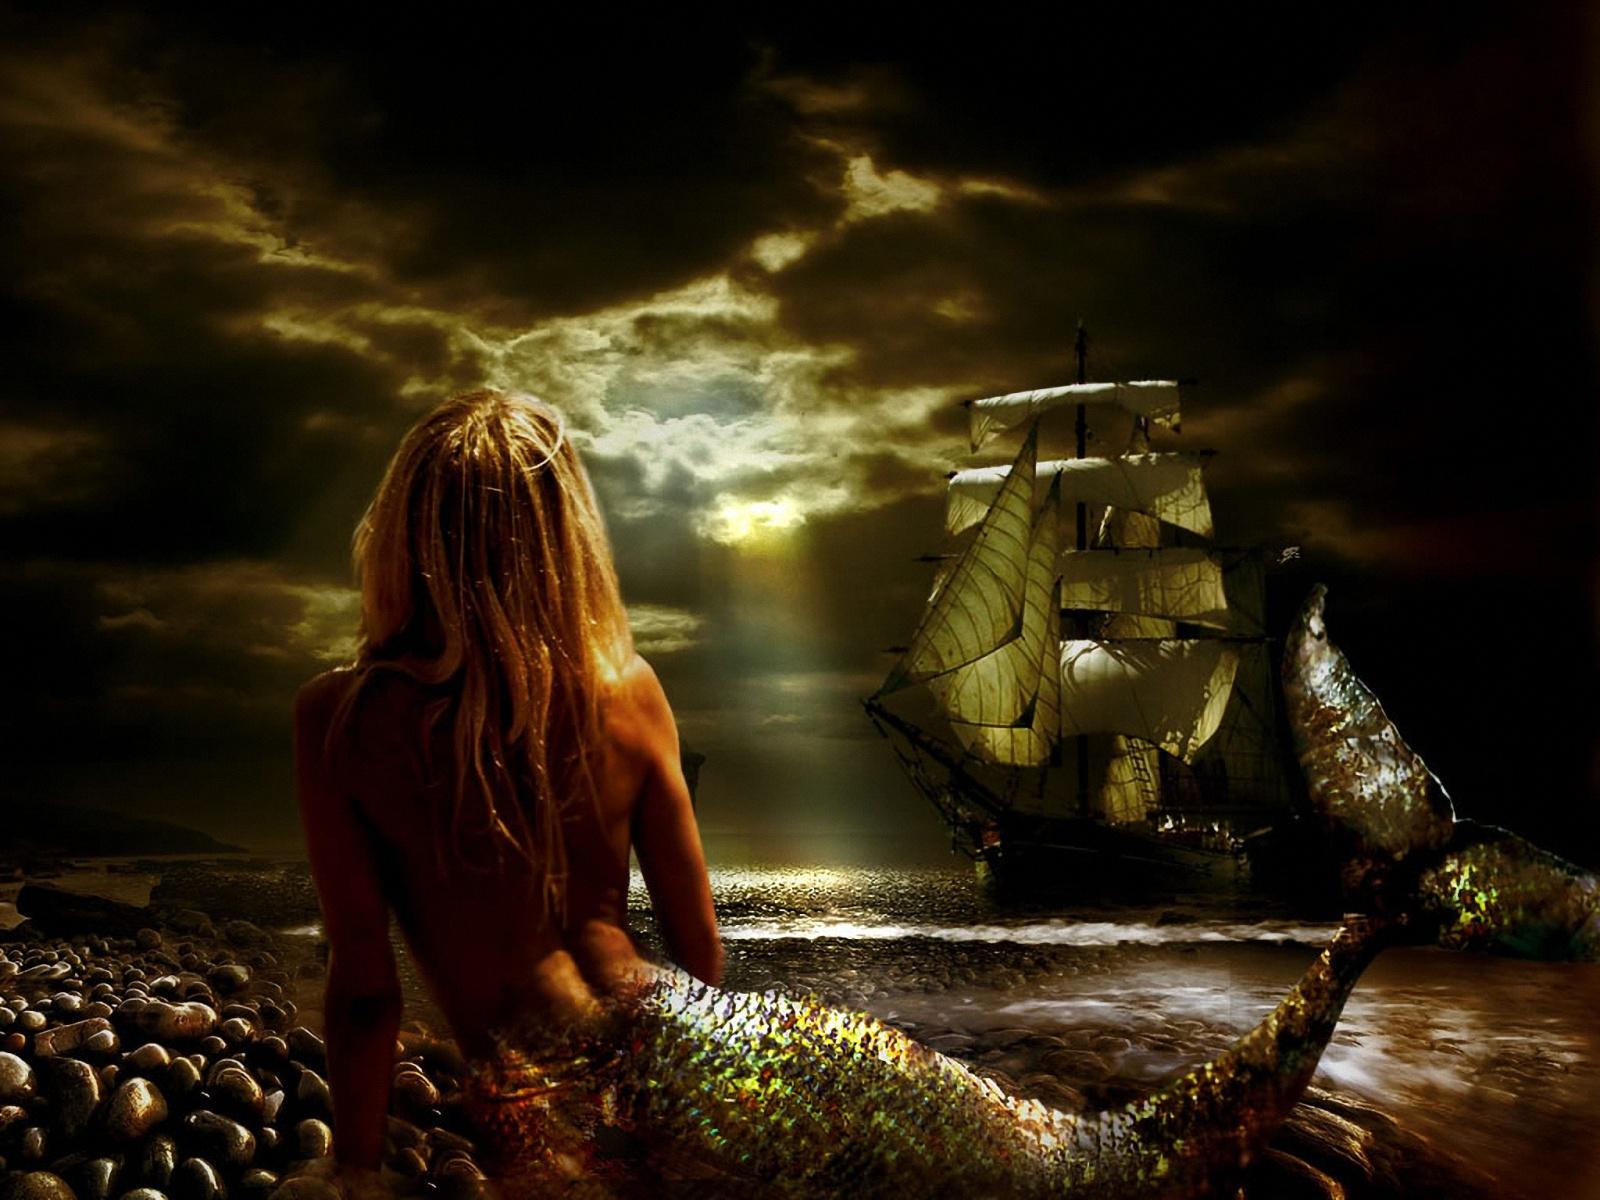 mitologia-griegos-griega-leyendas-homero-la-odisea-sirenas-ulises